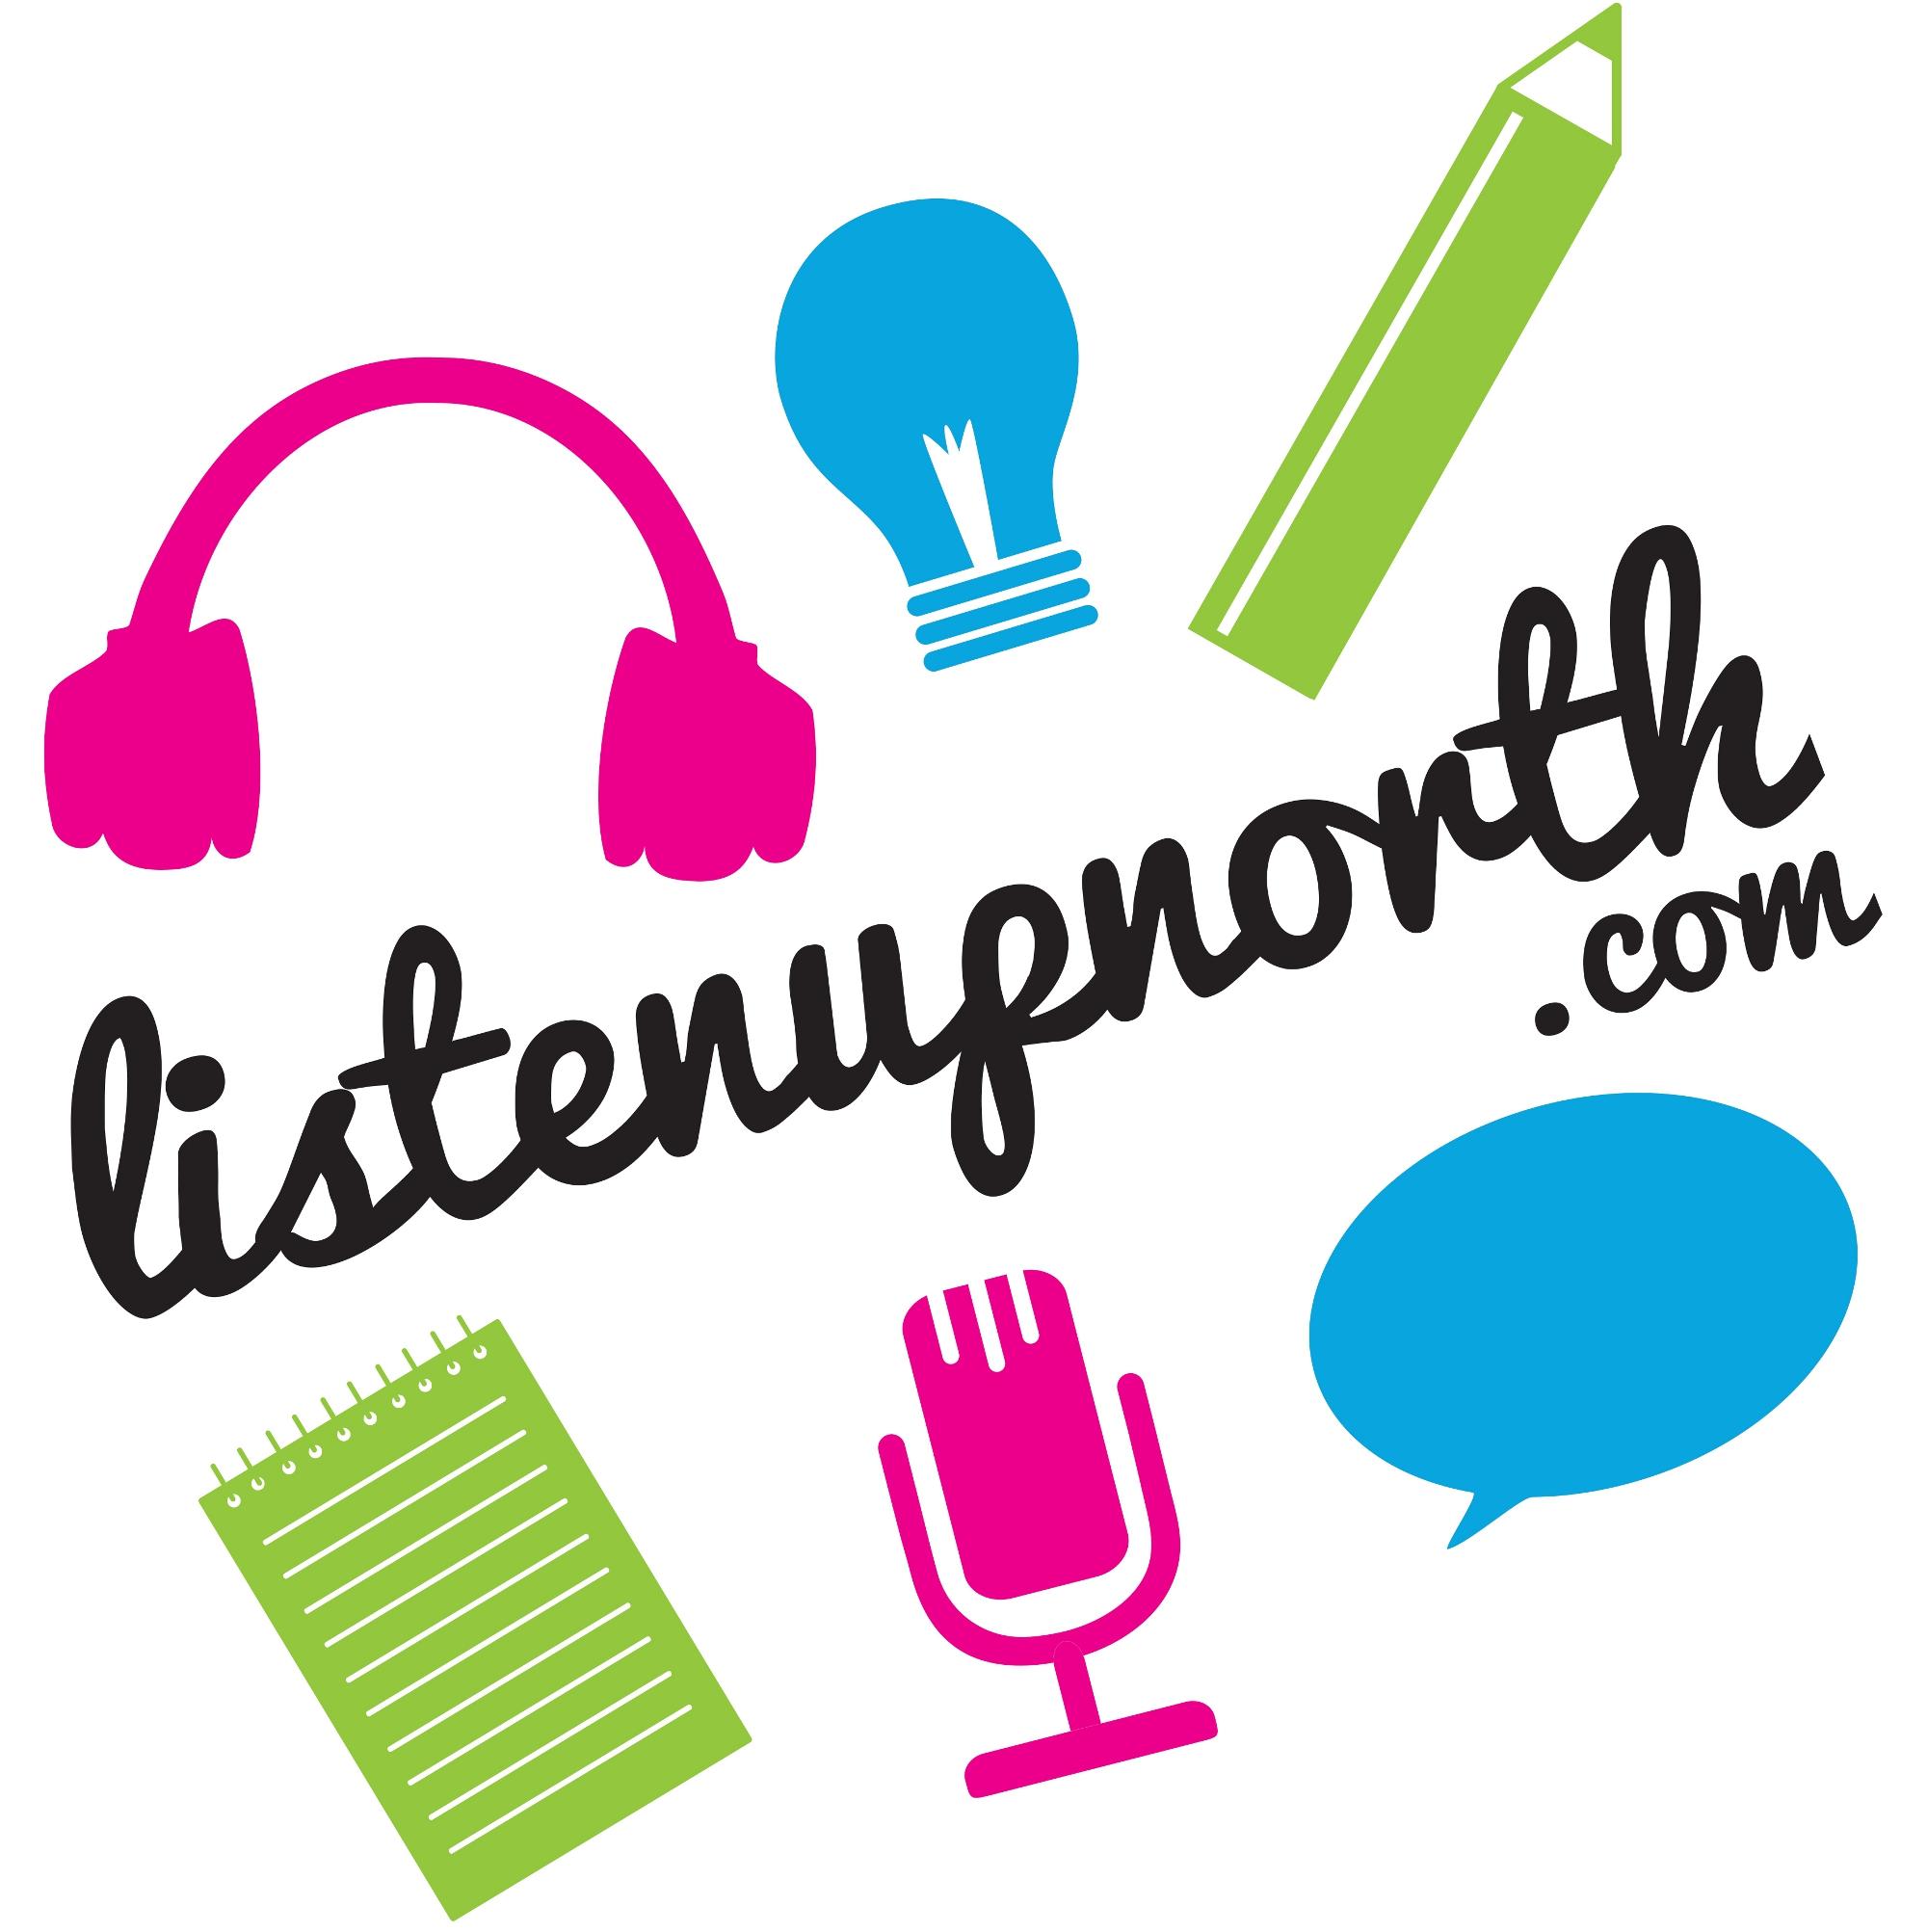 listenupnorth show art